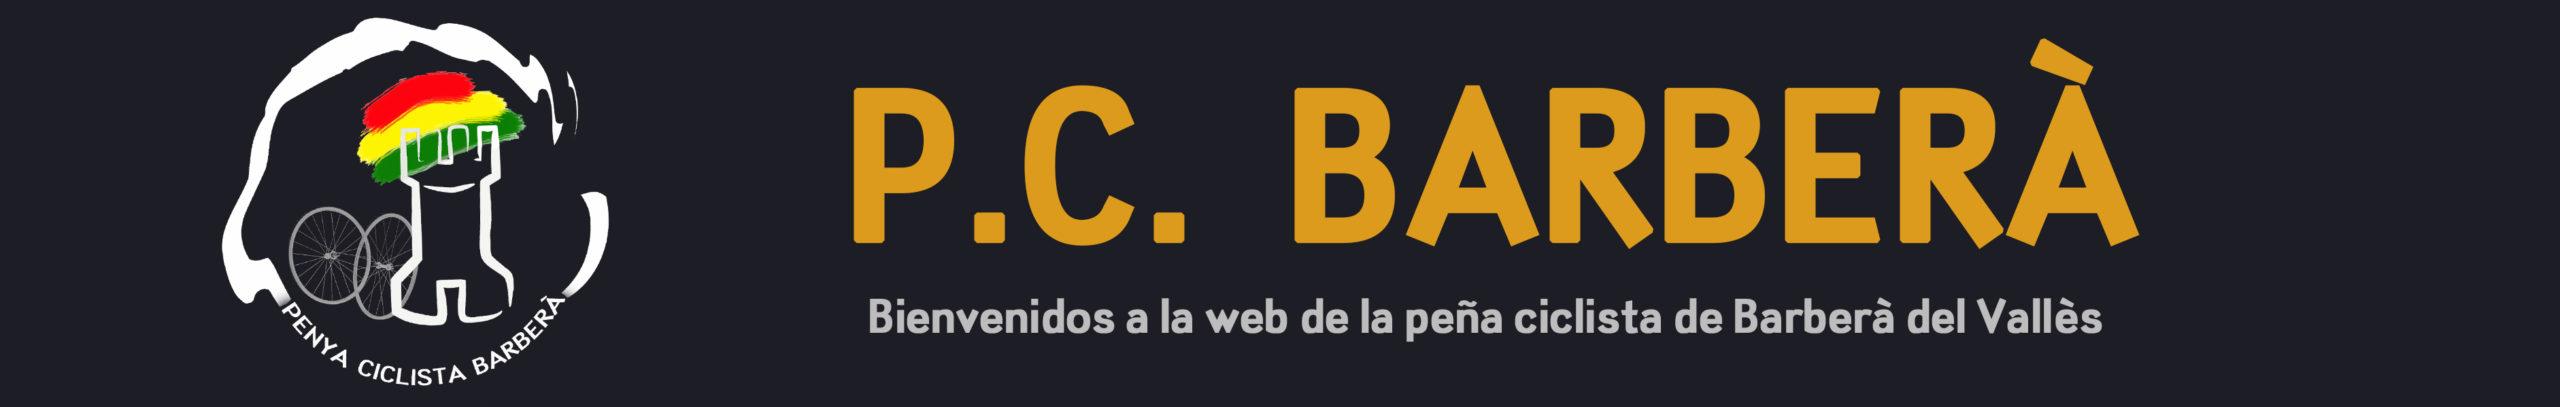 PC Barbera